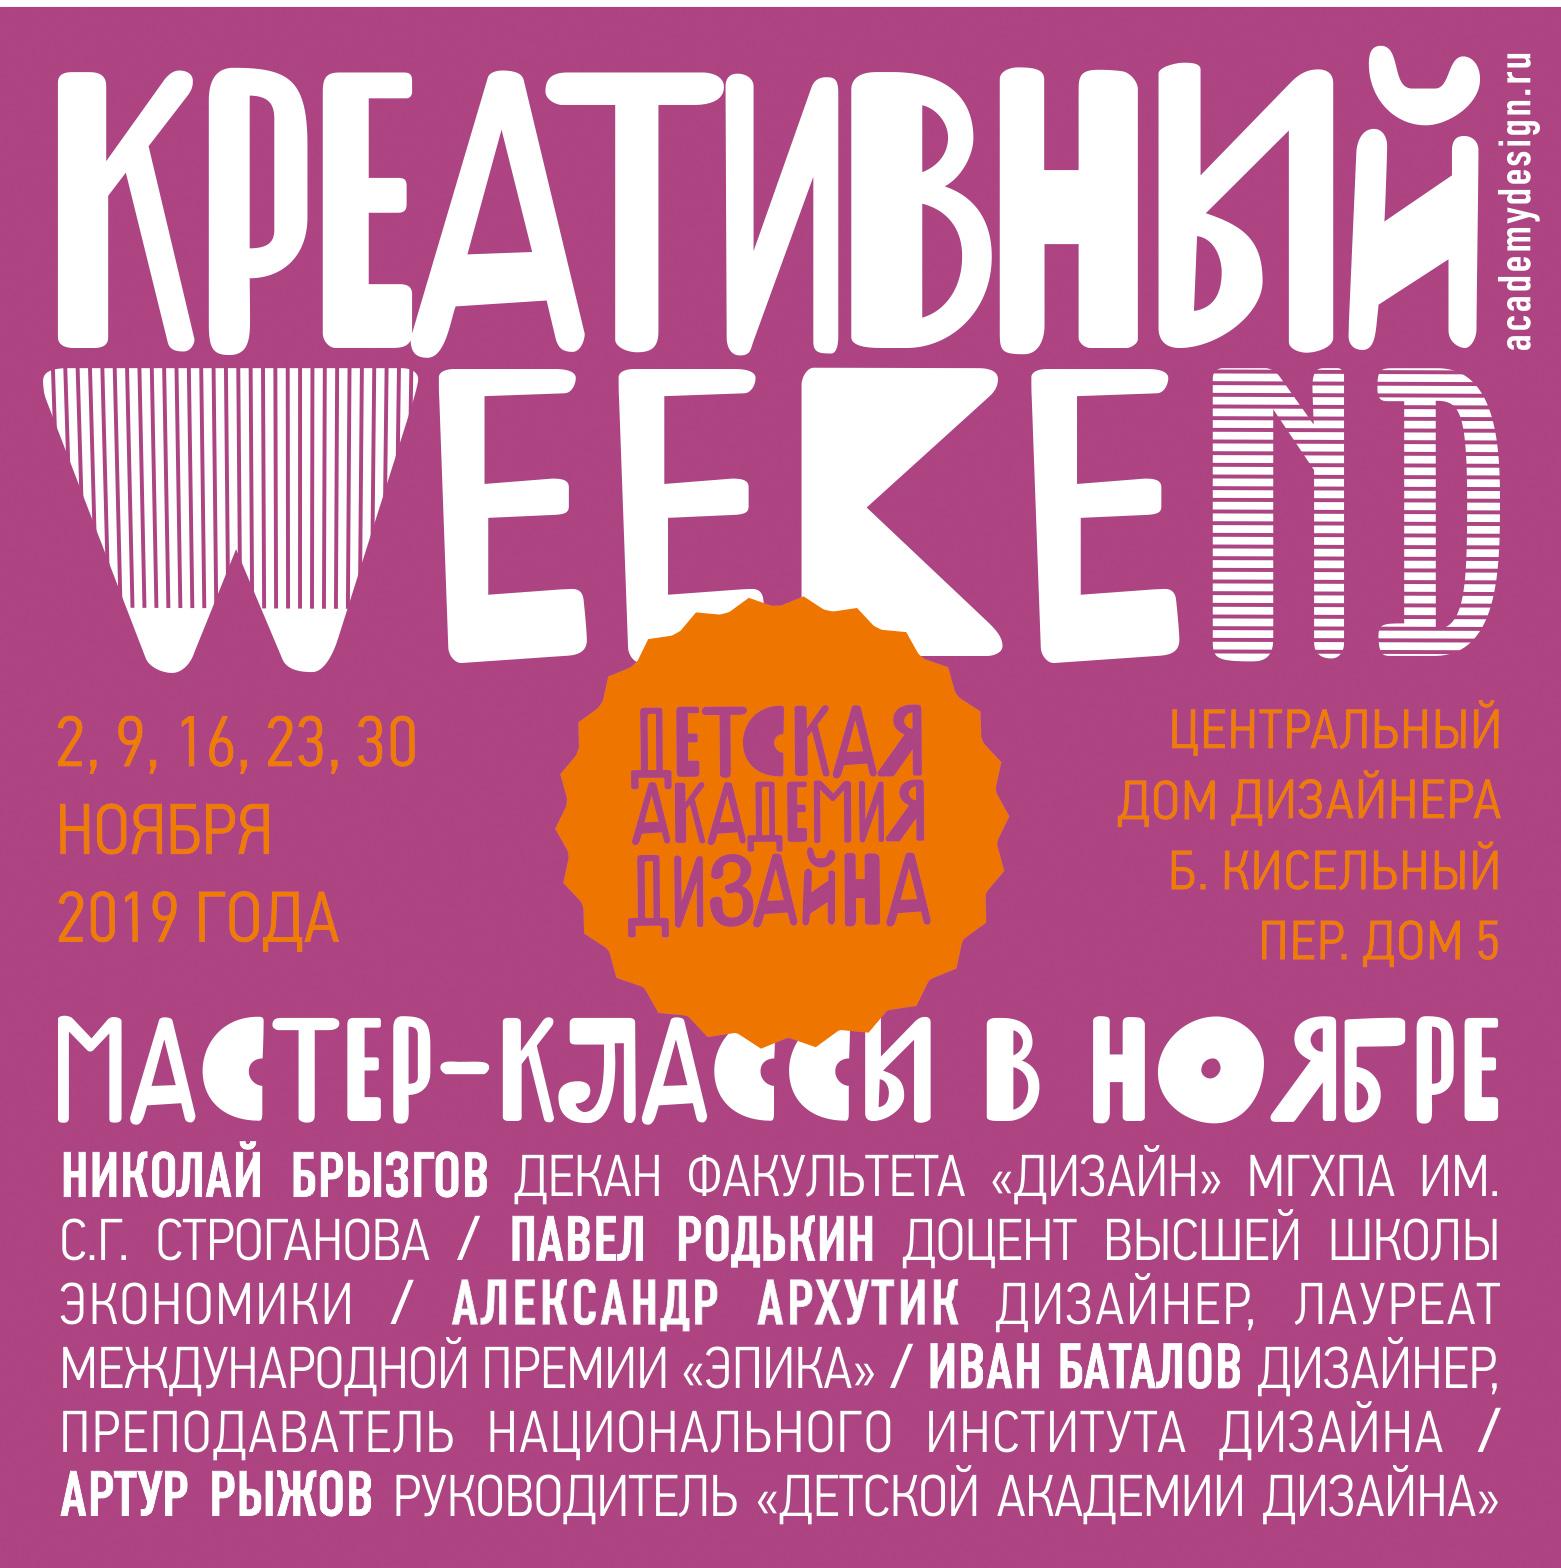 «Креативные уикенды»